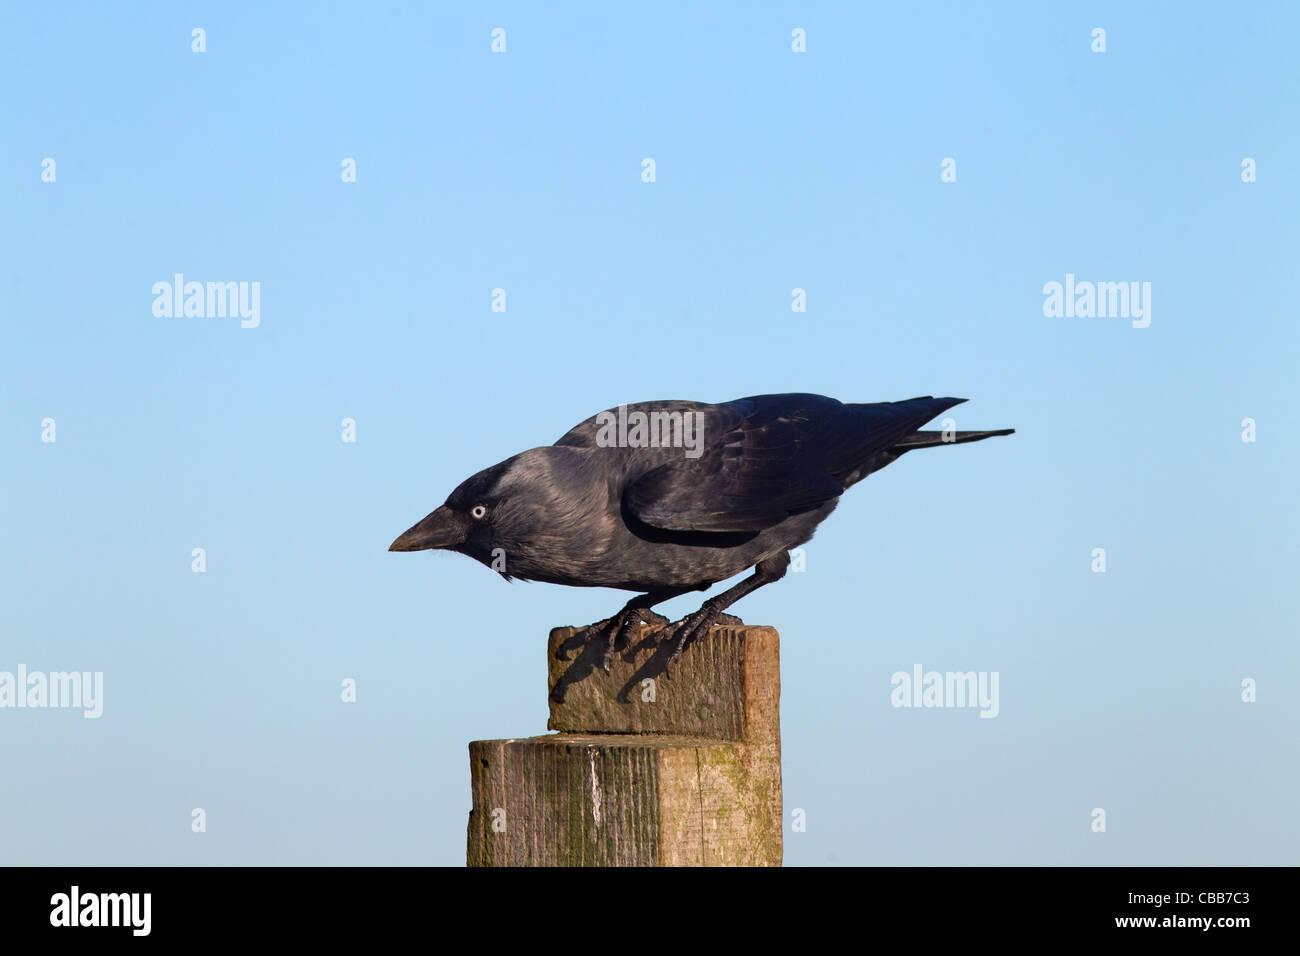 A single Jackdaw Corvus monedula perched on farm fence - Stock Image